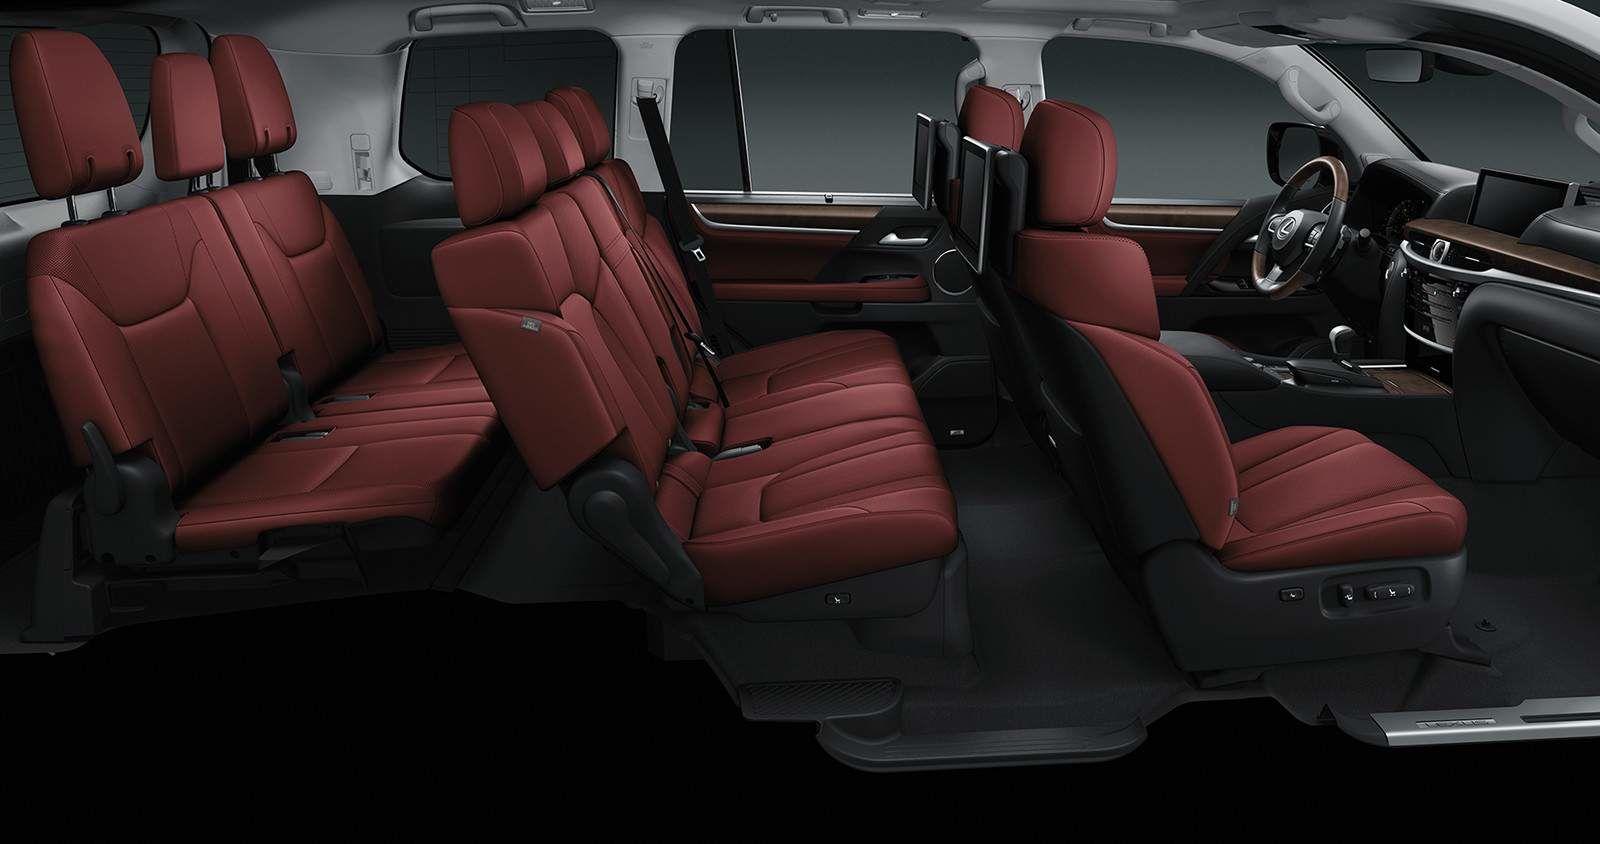 Lexus 2020 Lx 570 Interior Cabernet Leather L